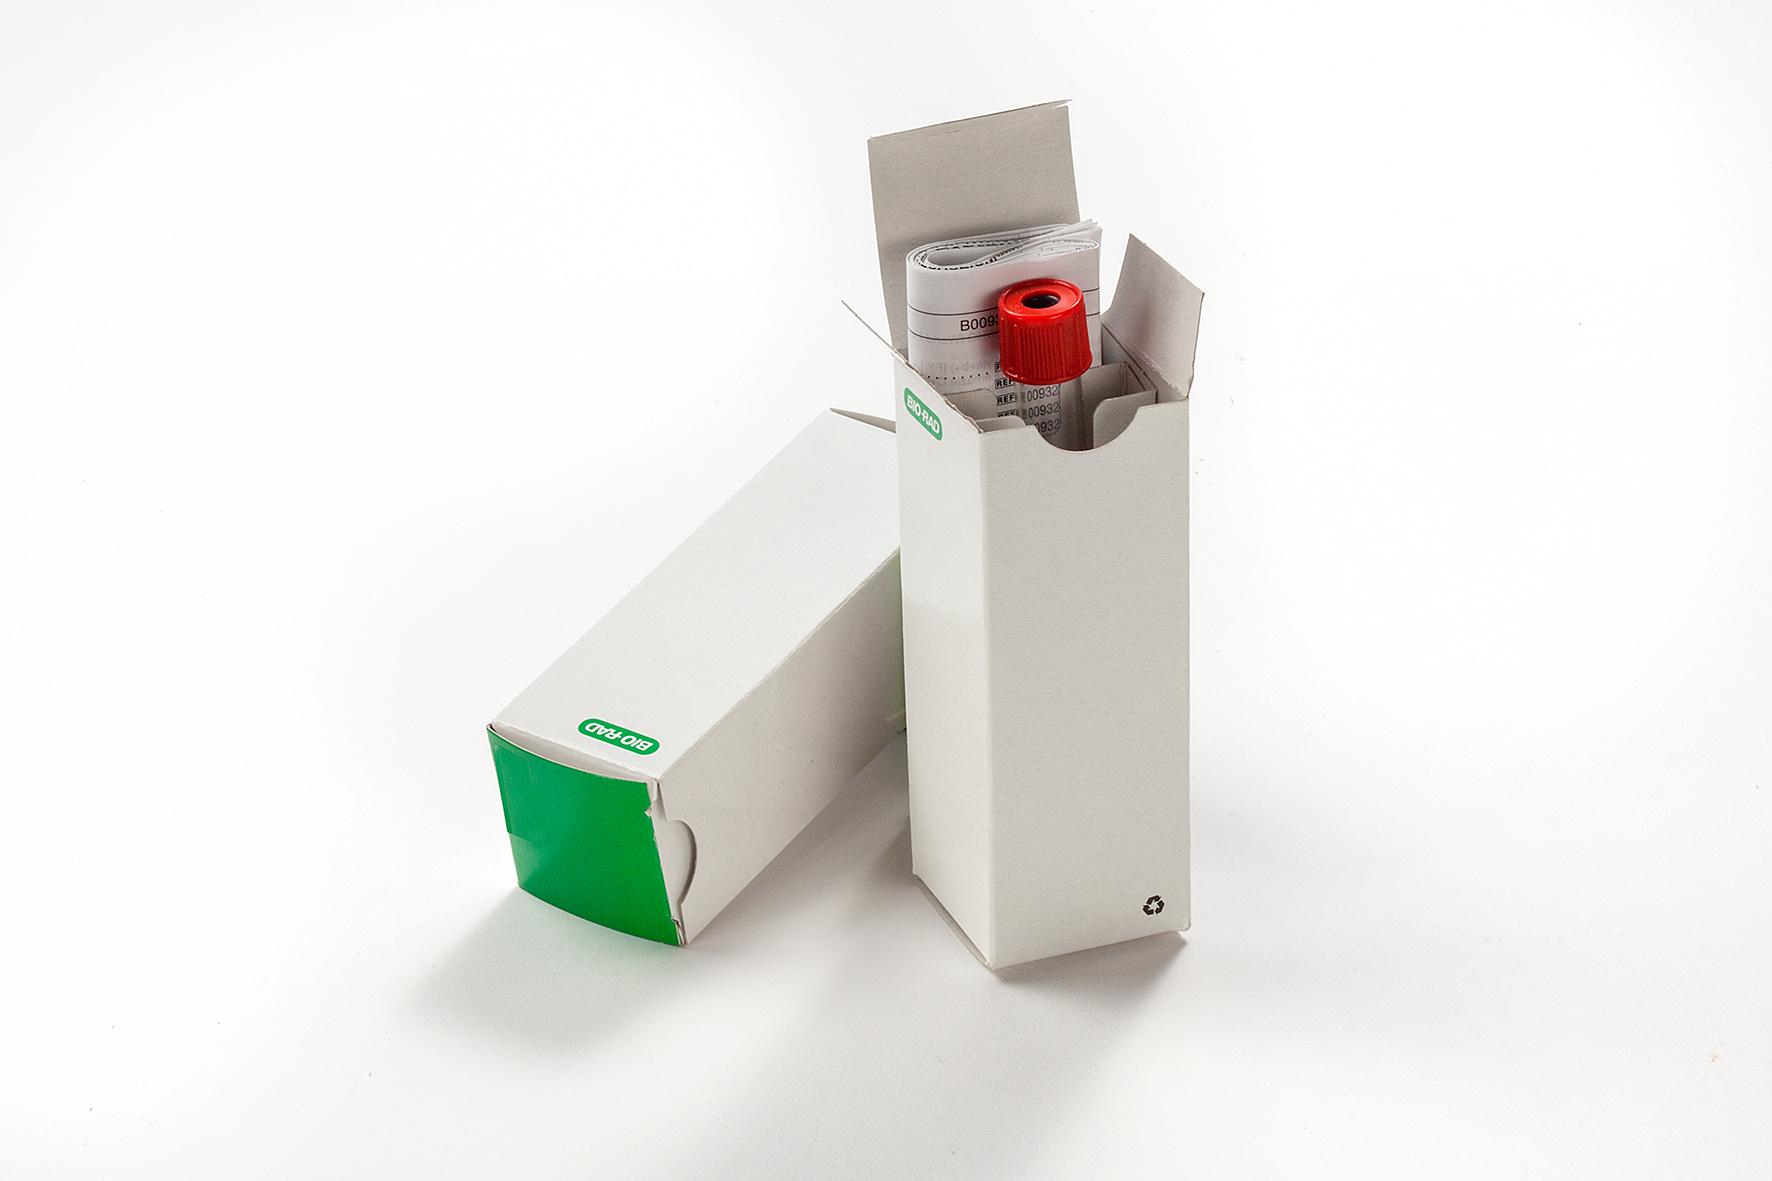 carton-award-image 140449